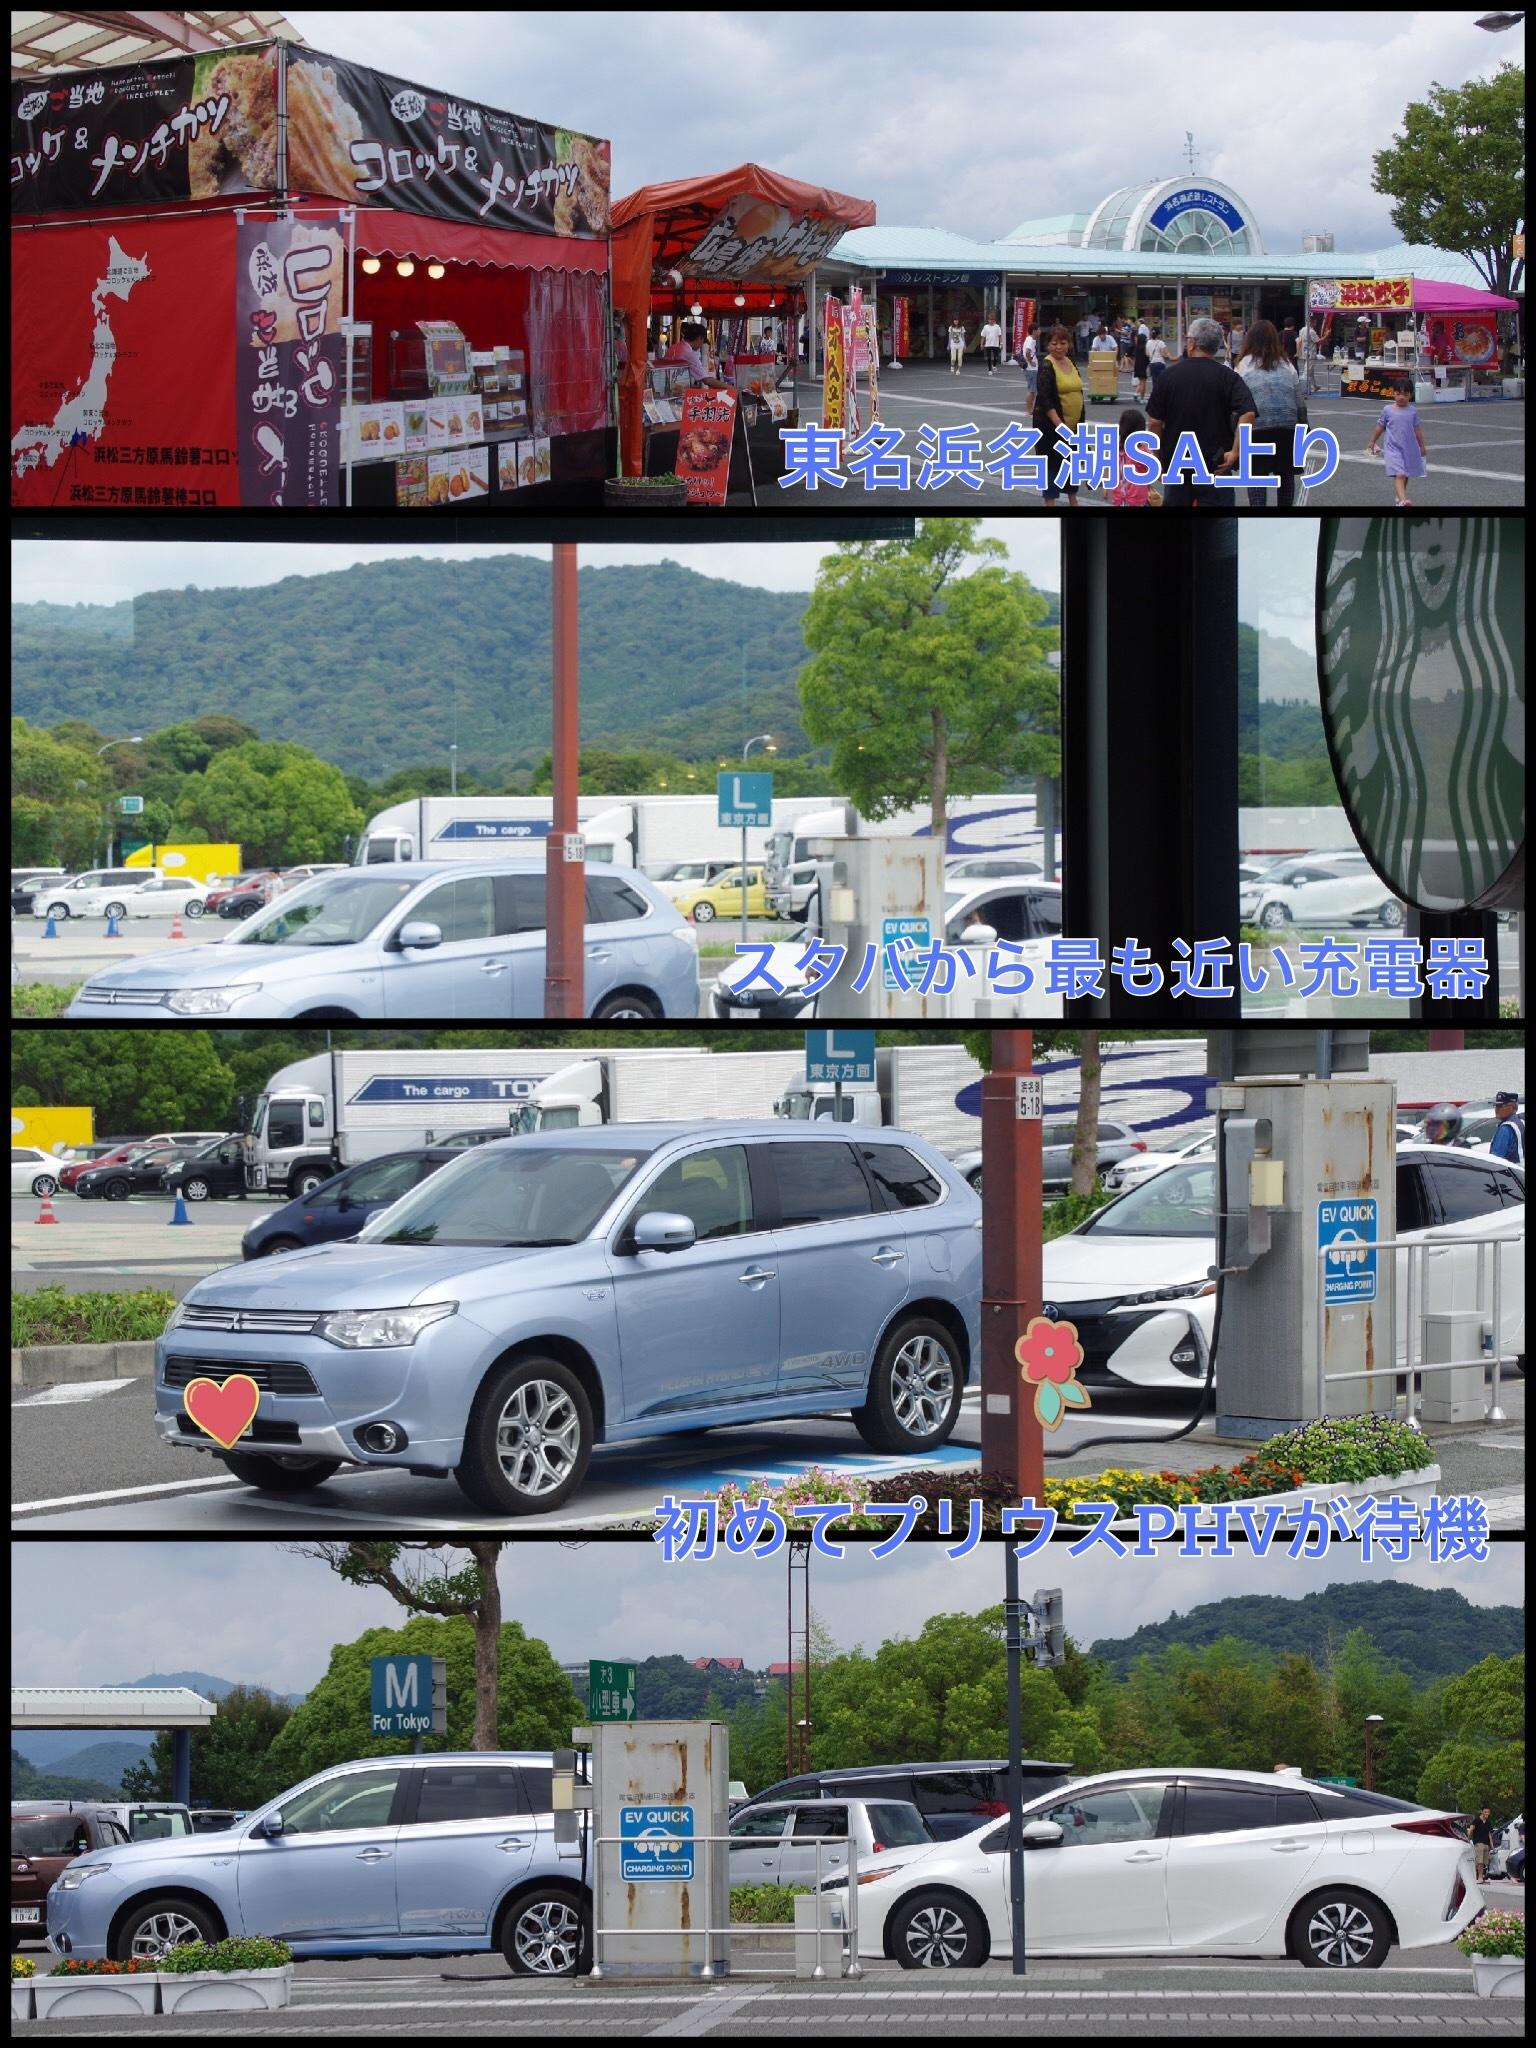 EV急速充電スポット 東名浜名湖SA 上り プリウスPHV アウトランダーPHEV